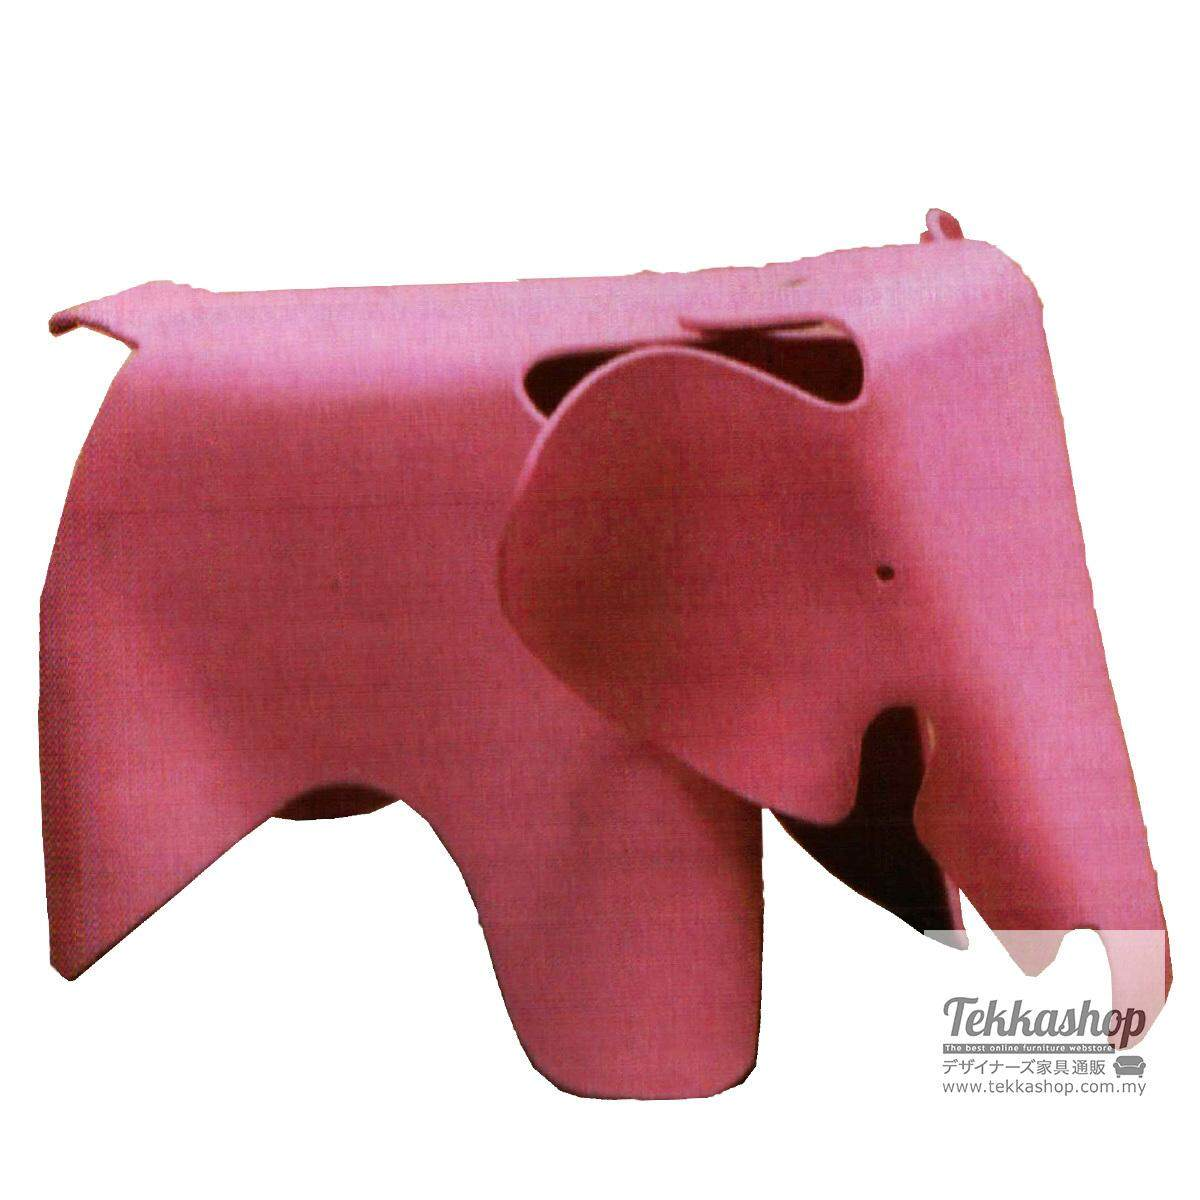 Tekkashop KKM3158LC Kindergarden Kid Furniture Elephant Shape Ottoman Seat, Pink